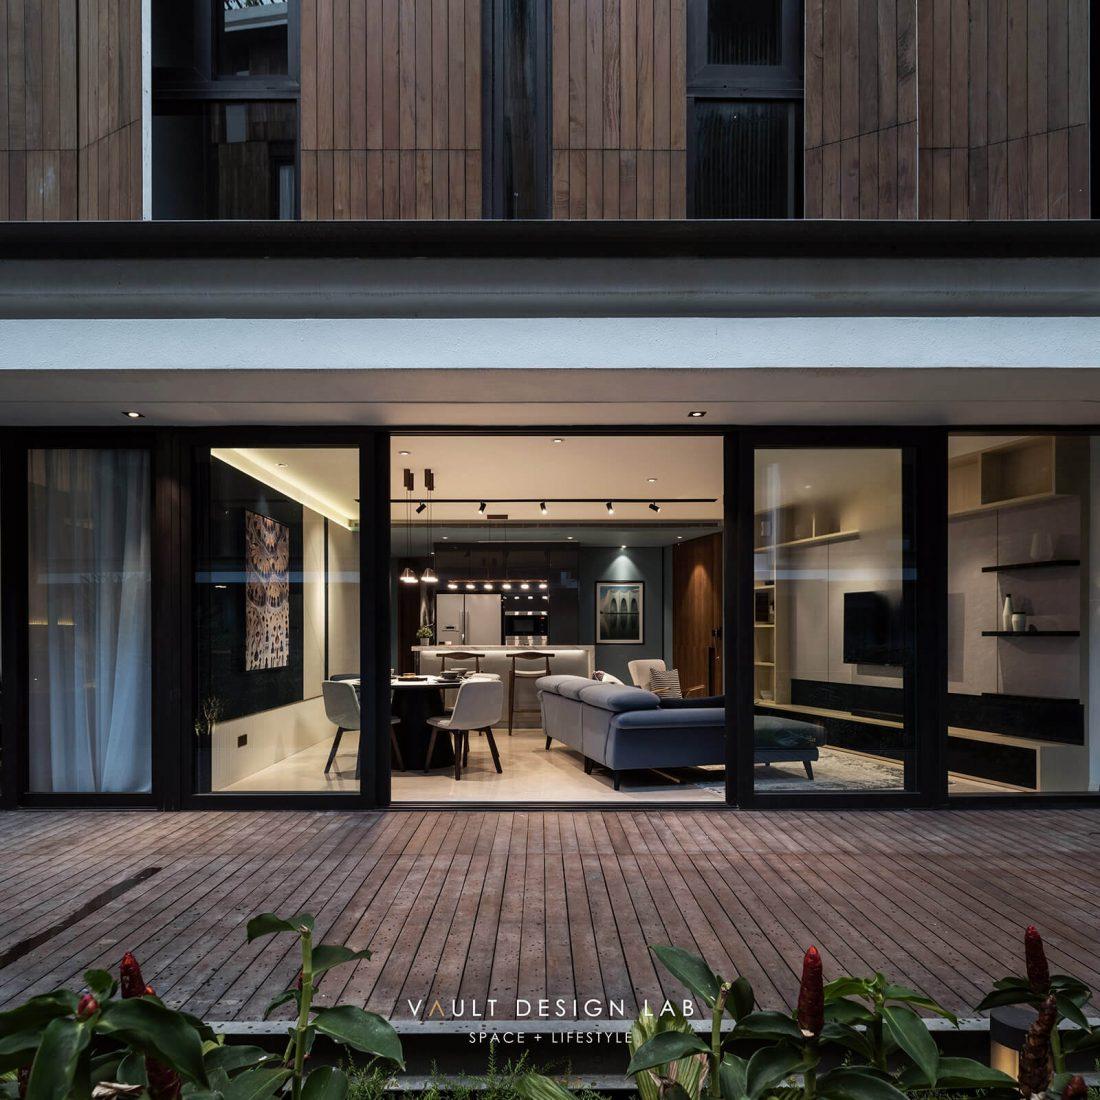 Interior-Design-Shorefront-Condominium-Ytl-Penang-Malaysia-Exterior-Design-v3